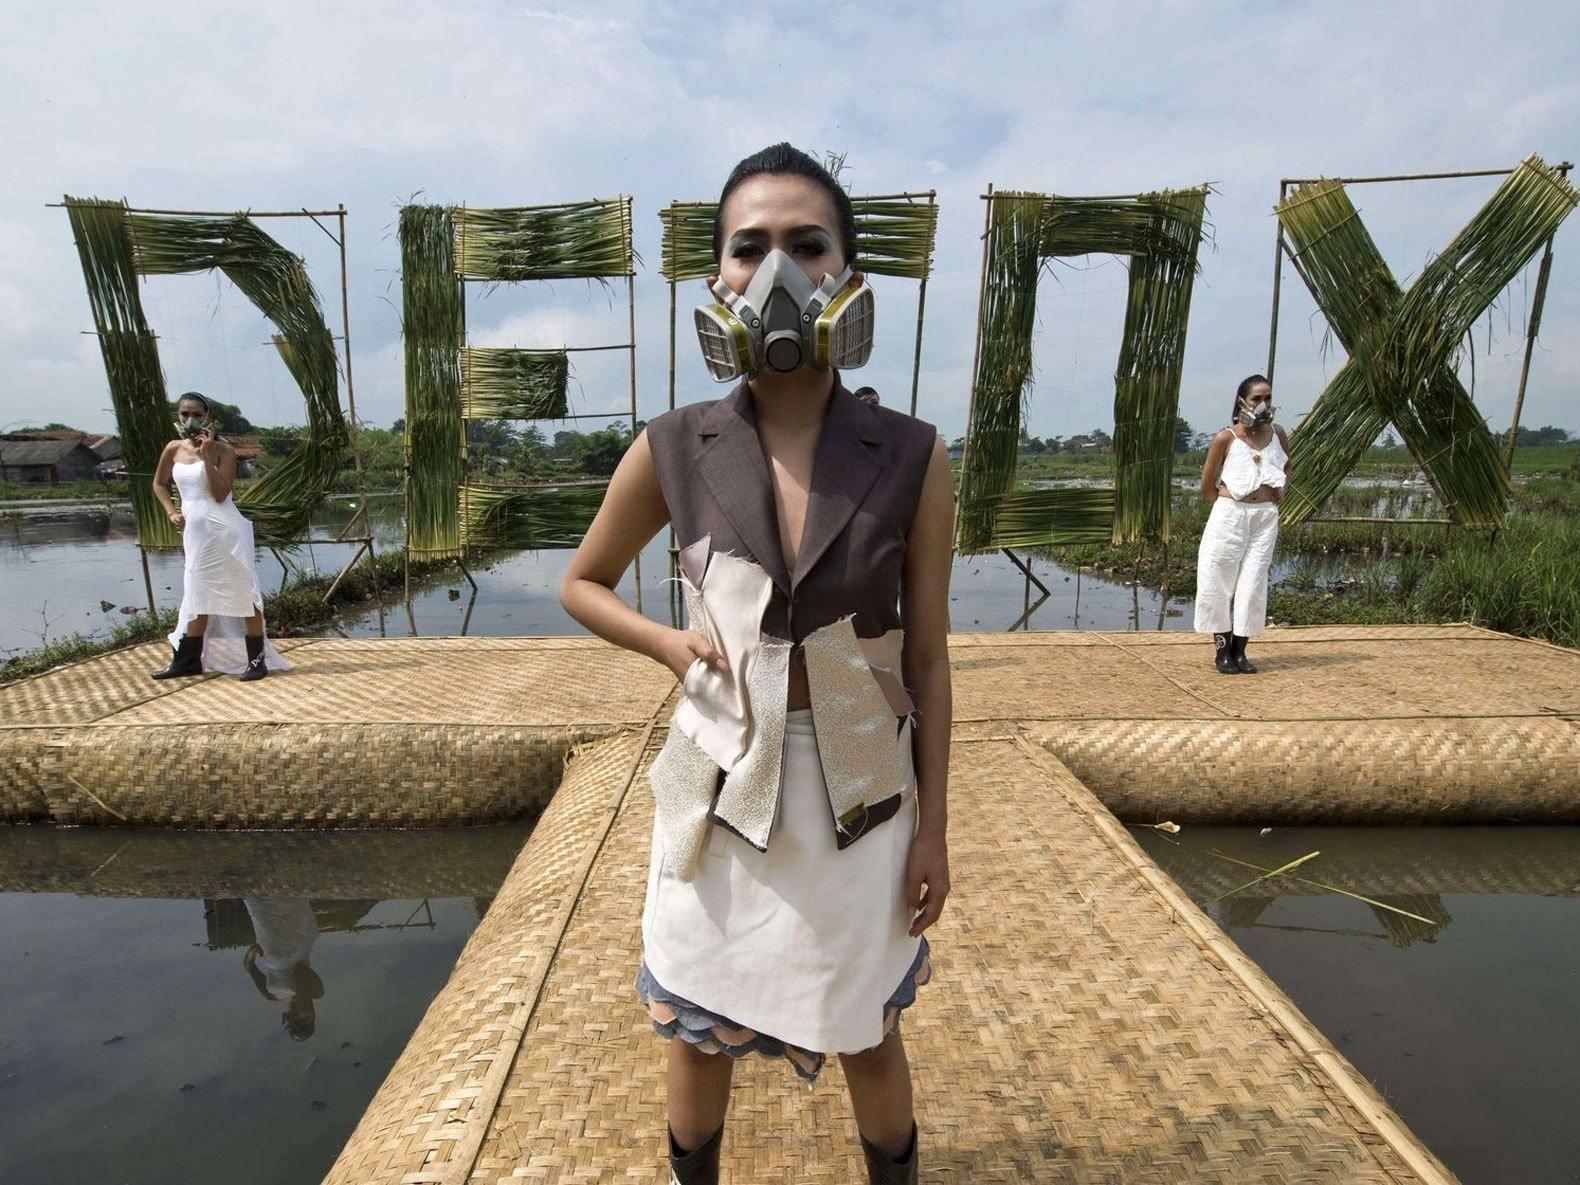 Camisetas de algodón: Campaña Detox de Greenpeace